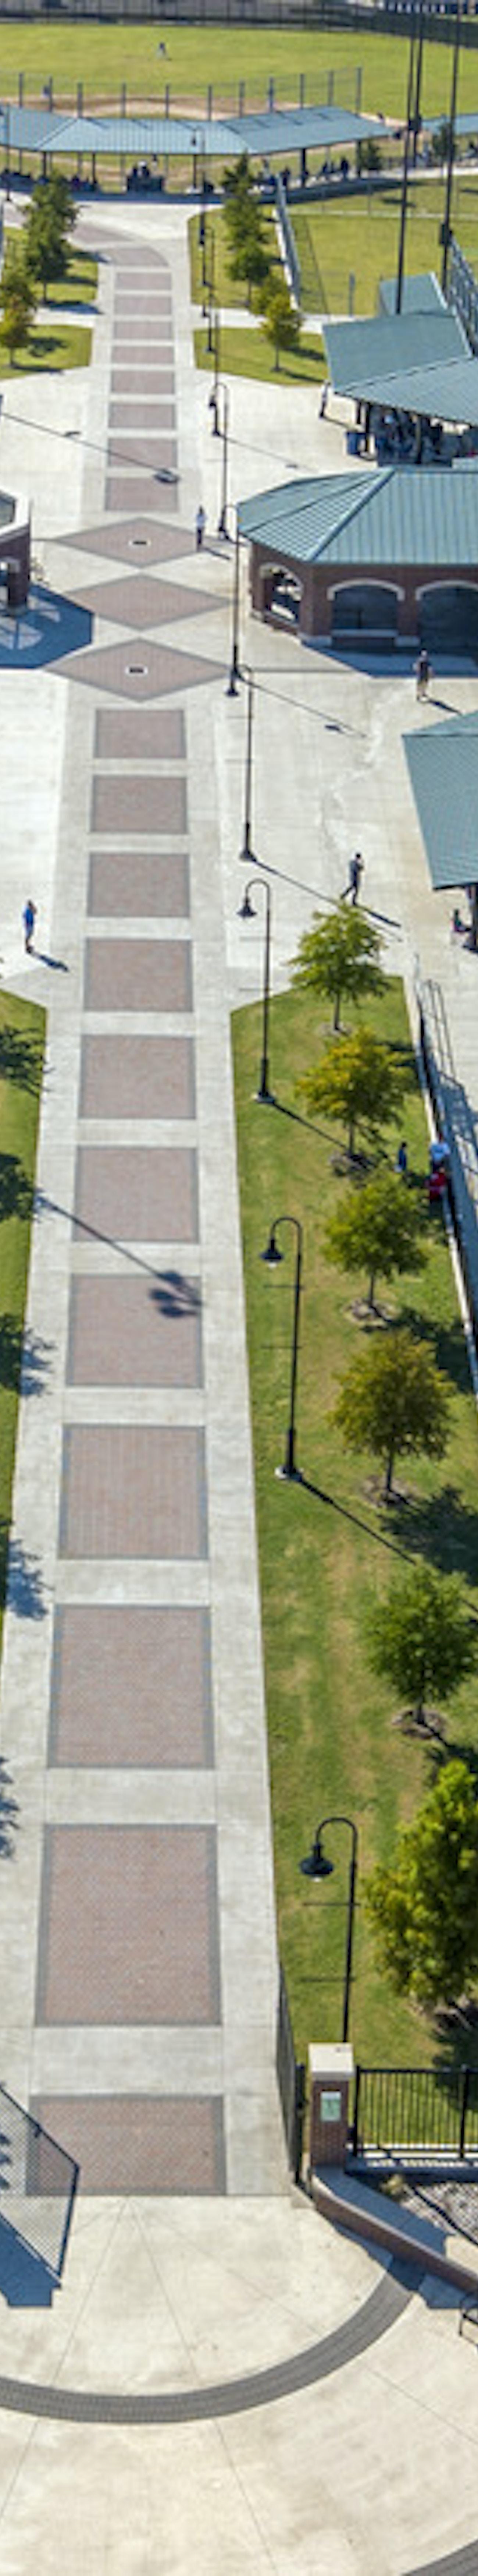 Harold Bacchus Community Park Sports Complex Addition